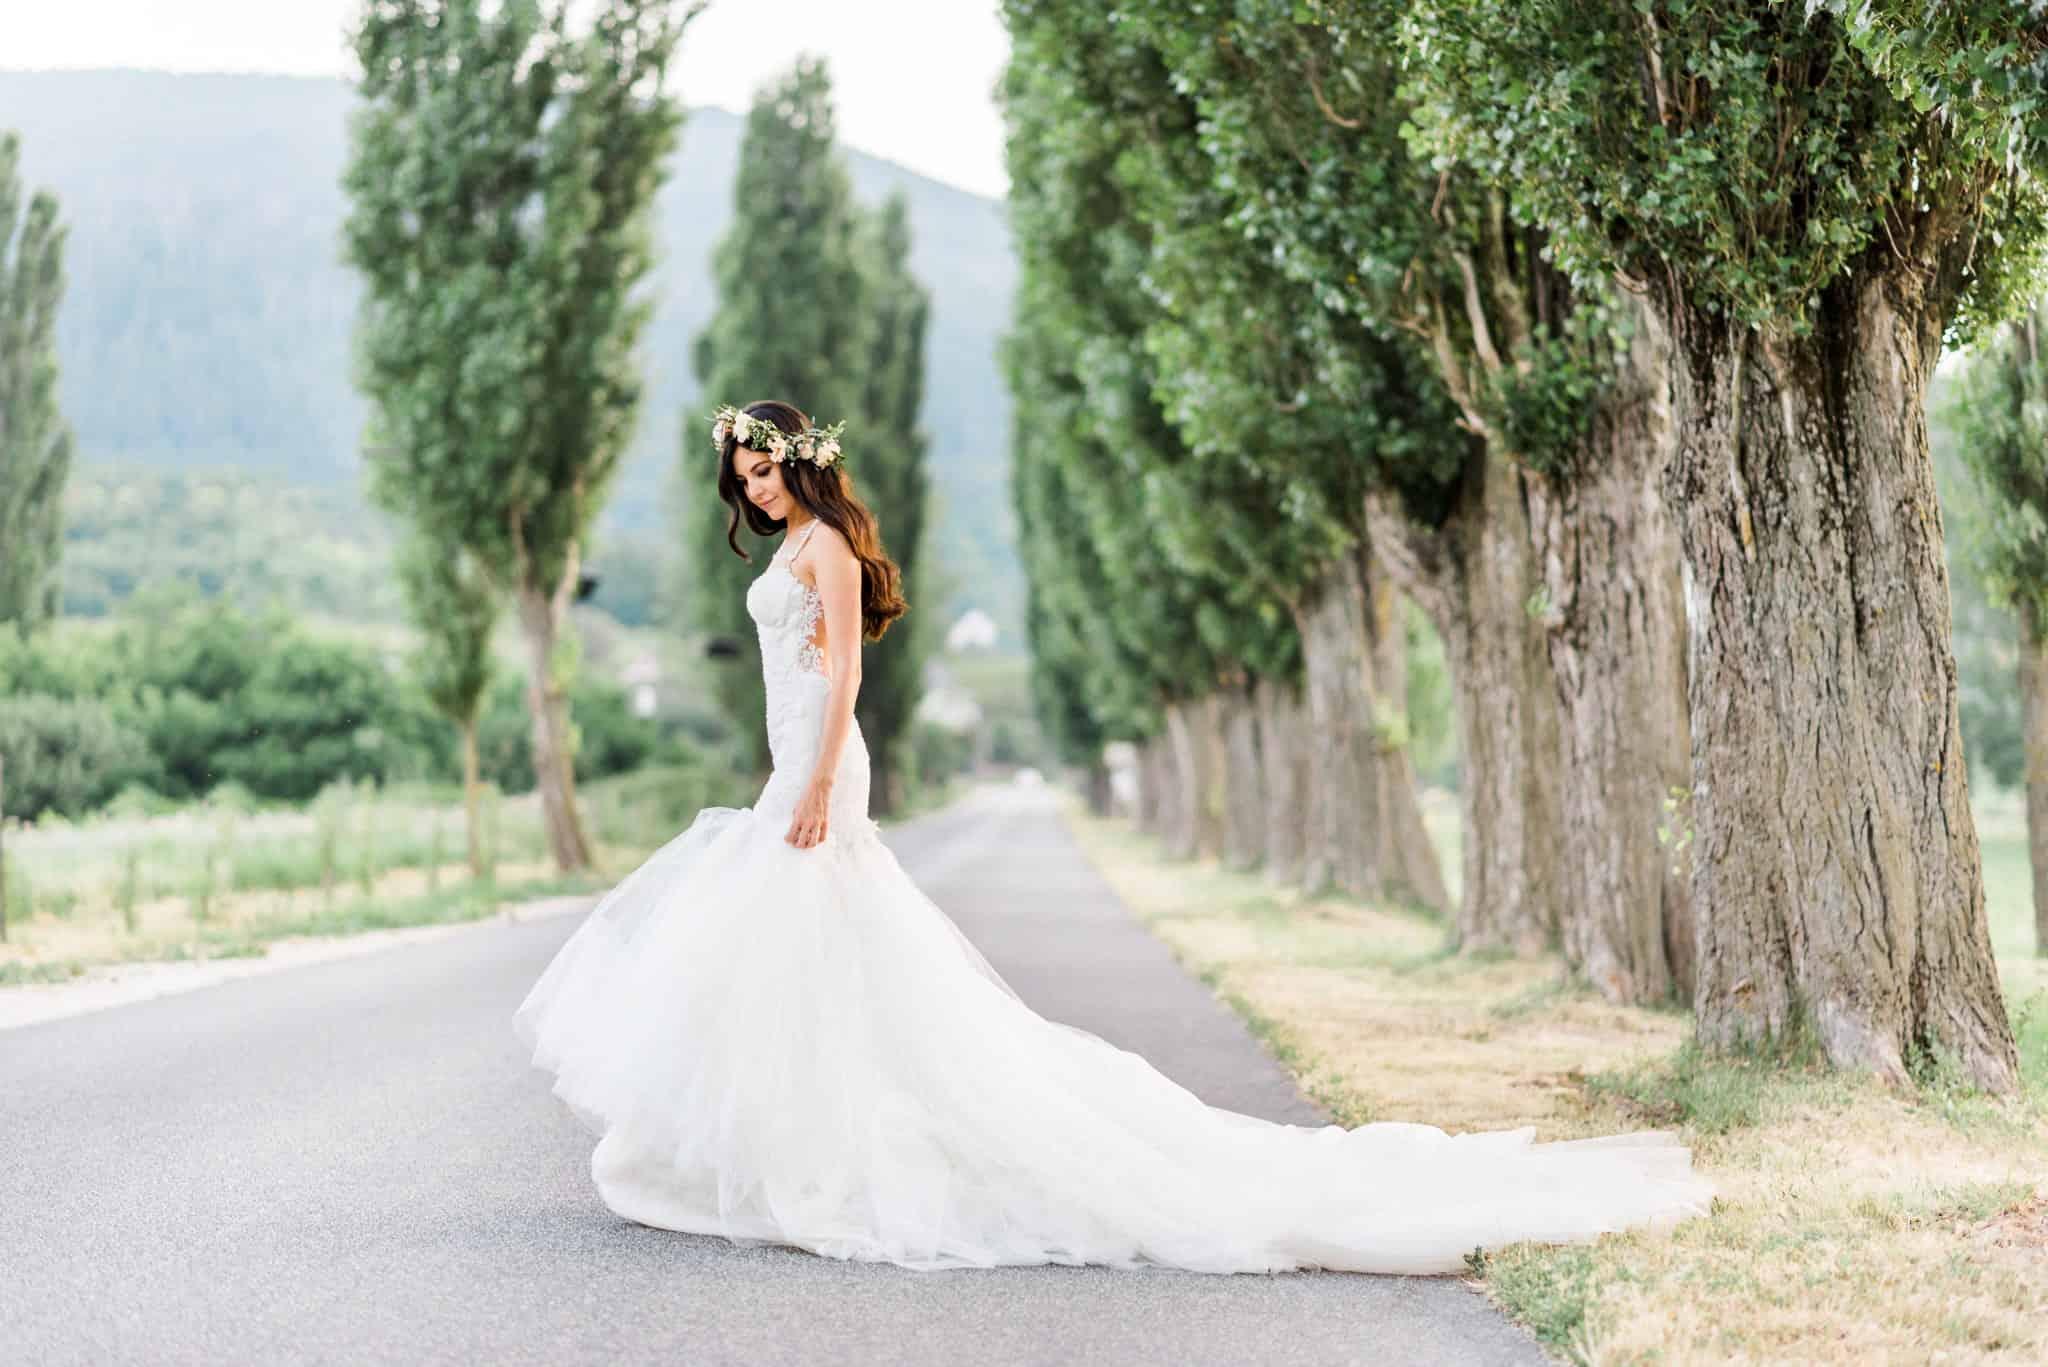 Wedoverhills_Prewedding_Bridal_Dress_Galia_Lahav_0033